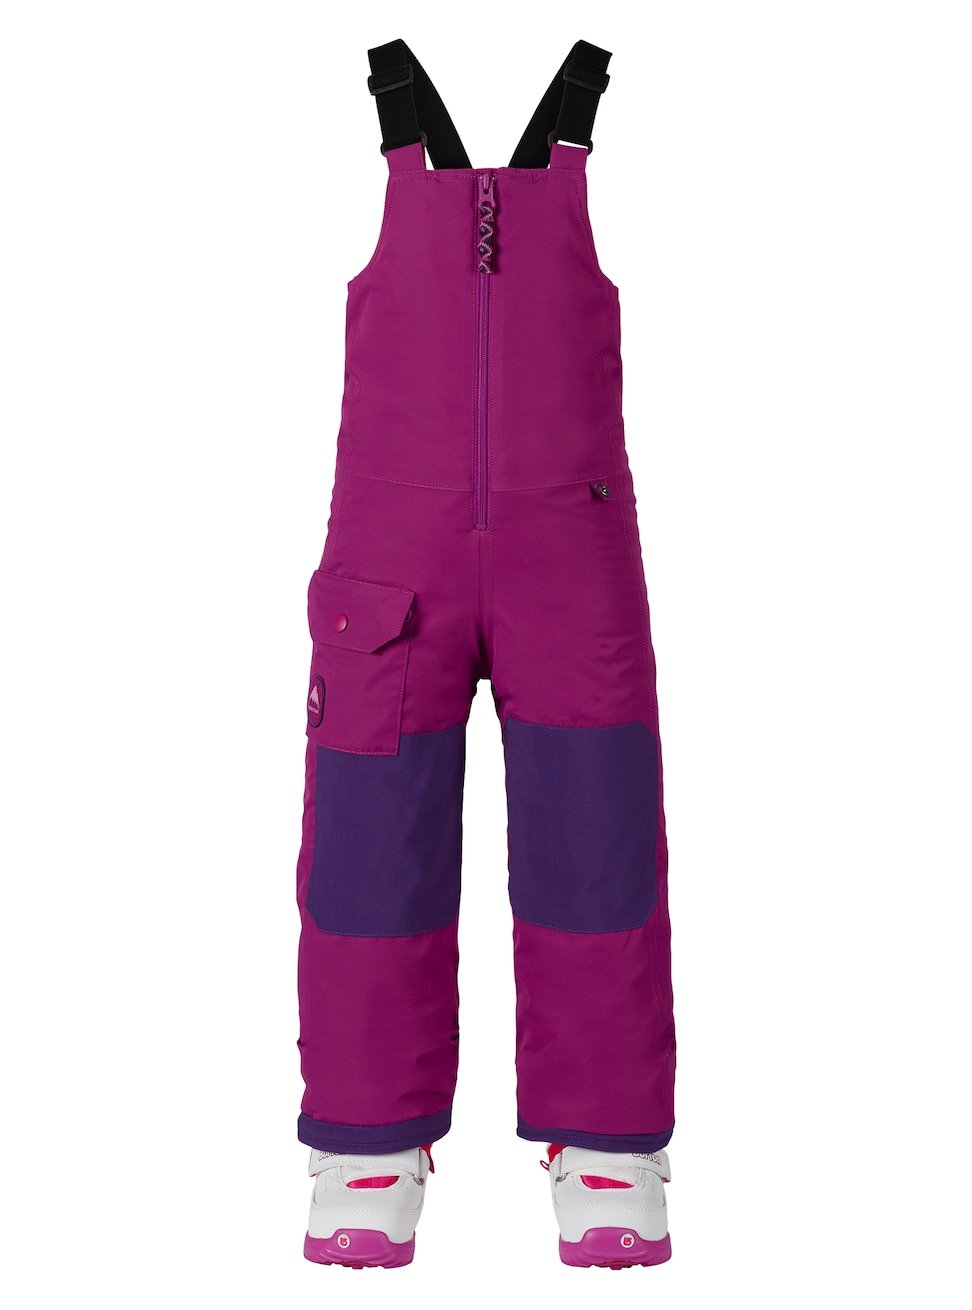 Burton Boys Minishred Maven Bib Pants, Grapeseed, 3T 130521